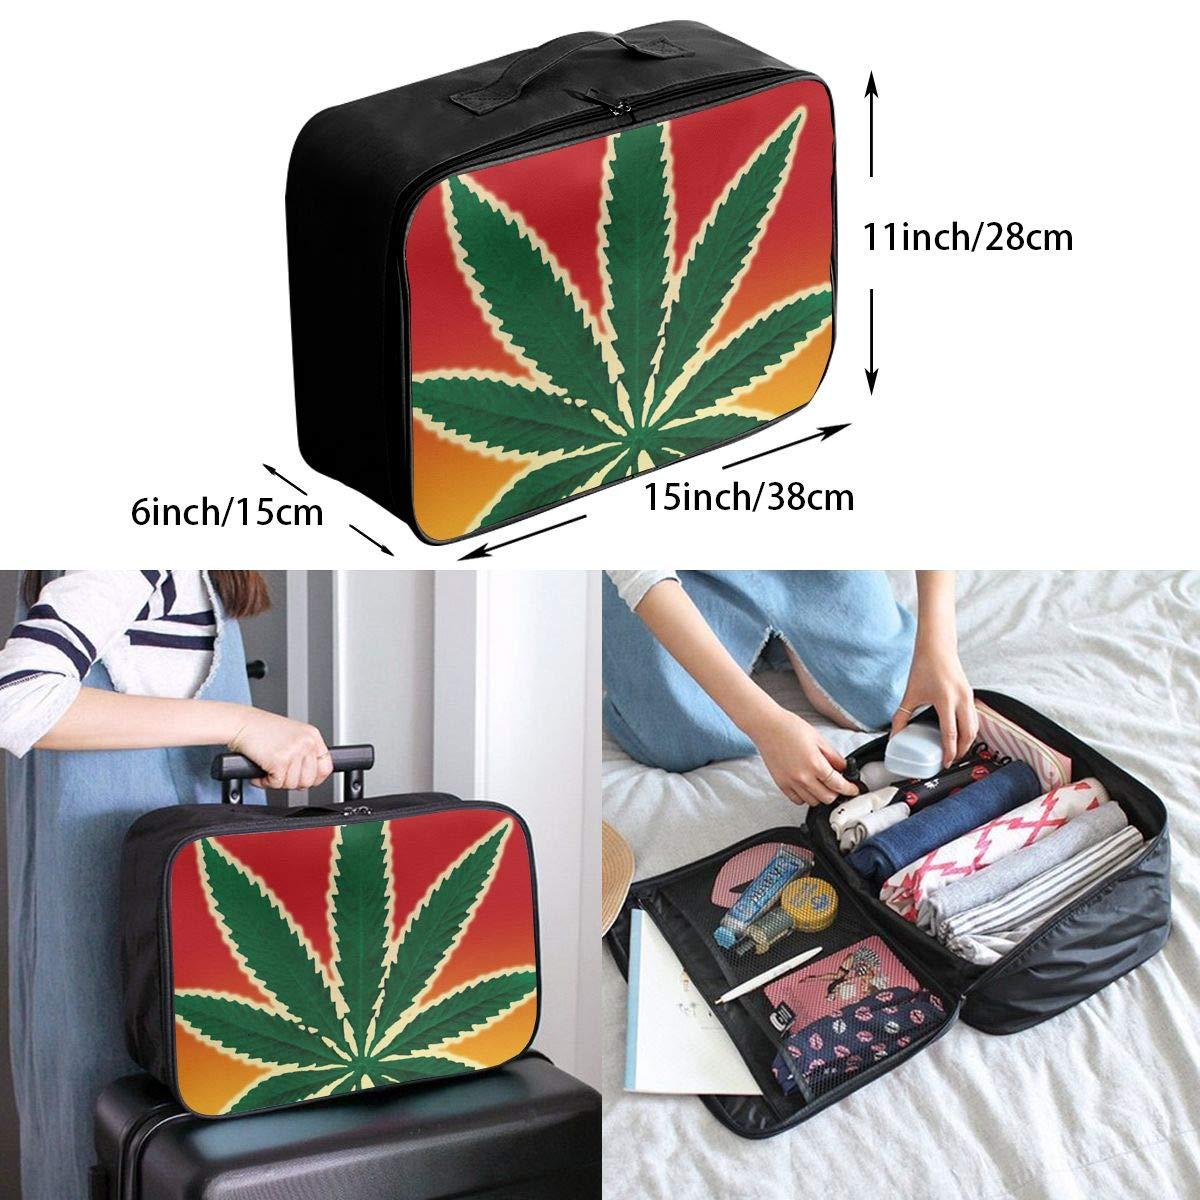 YueLJB Marijuana Legalization Blues Lightweight Large Capacity Portable Luggage Bag Travel Duffel Bag Storage Carry Luggage Duffle Tote Bag